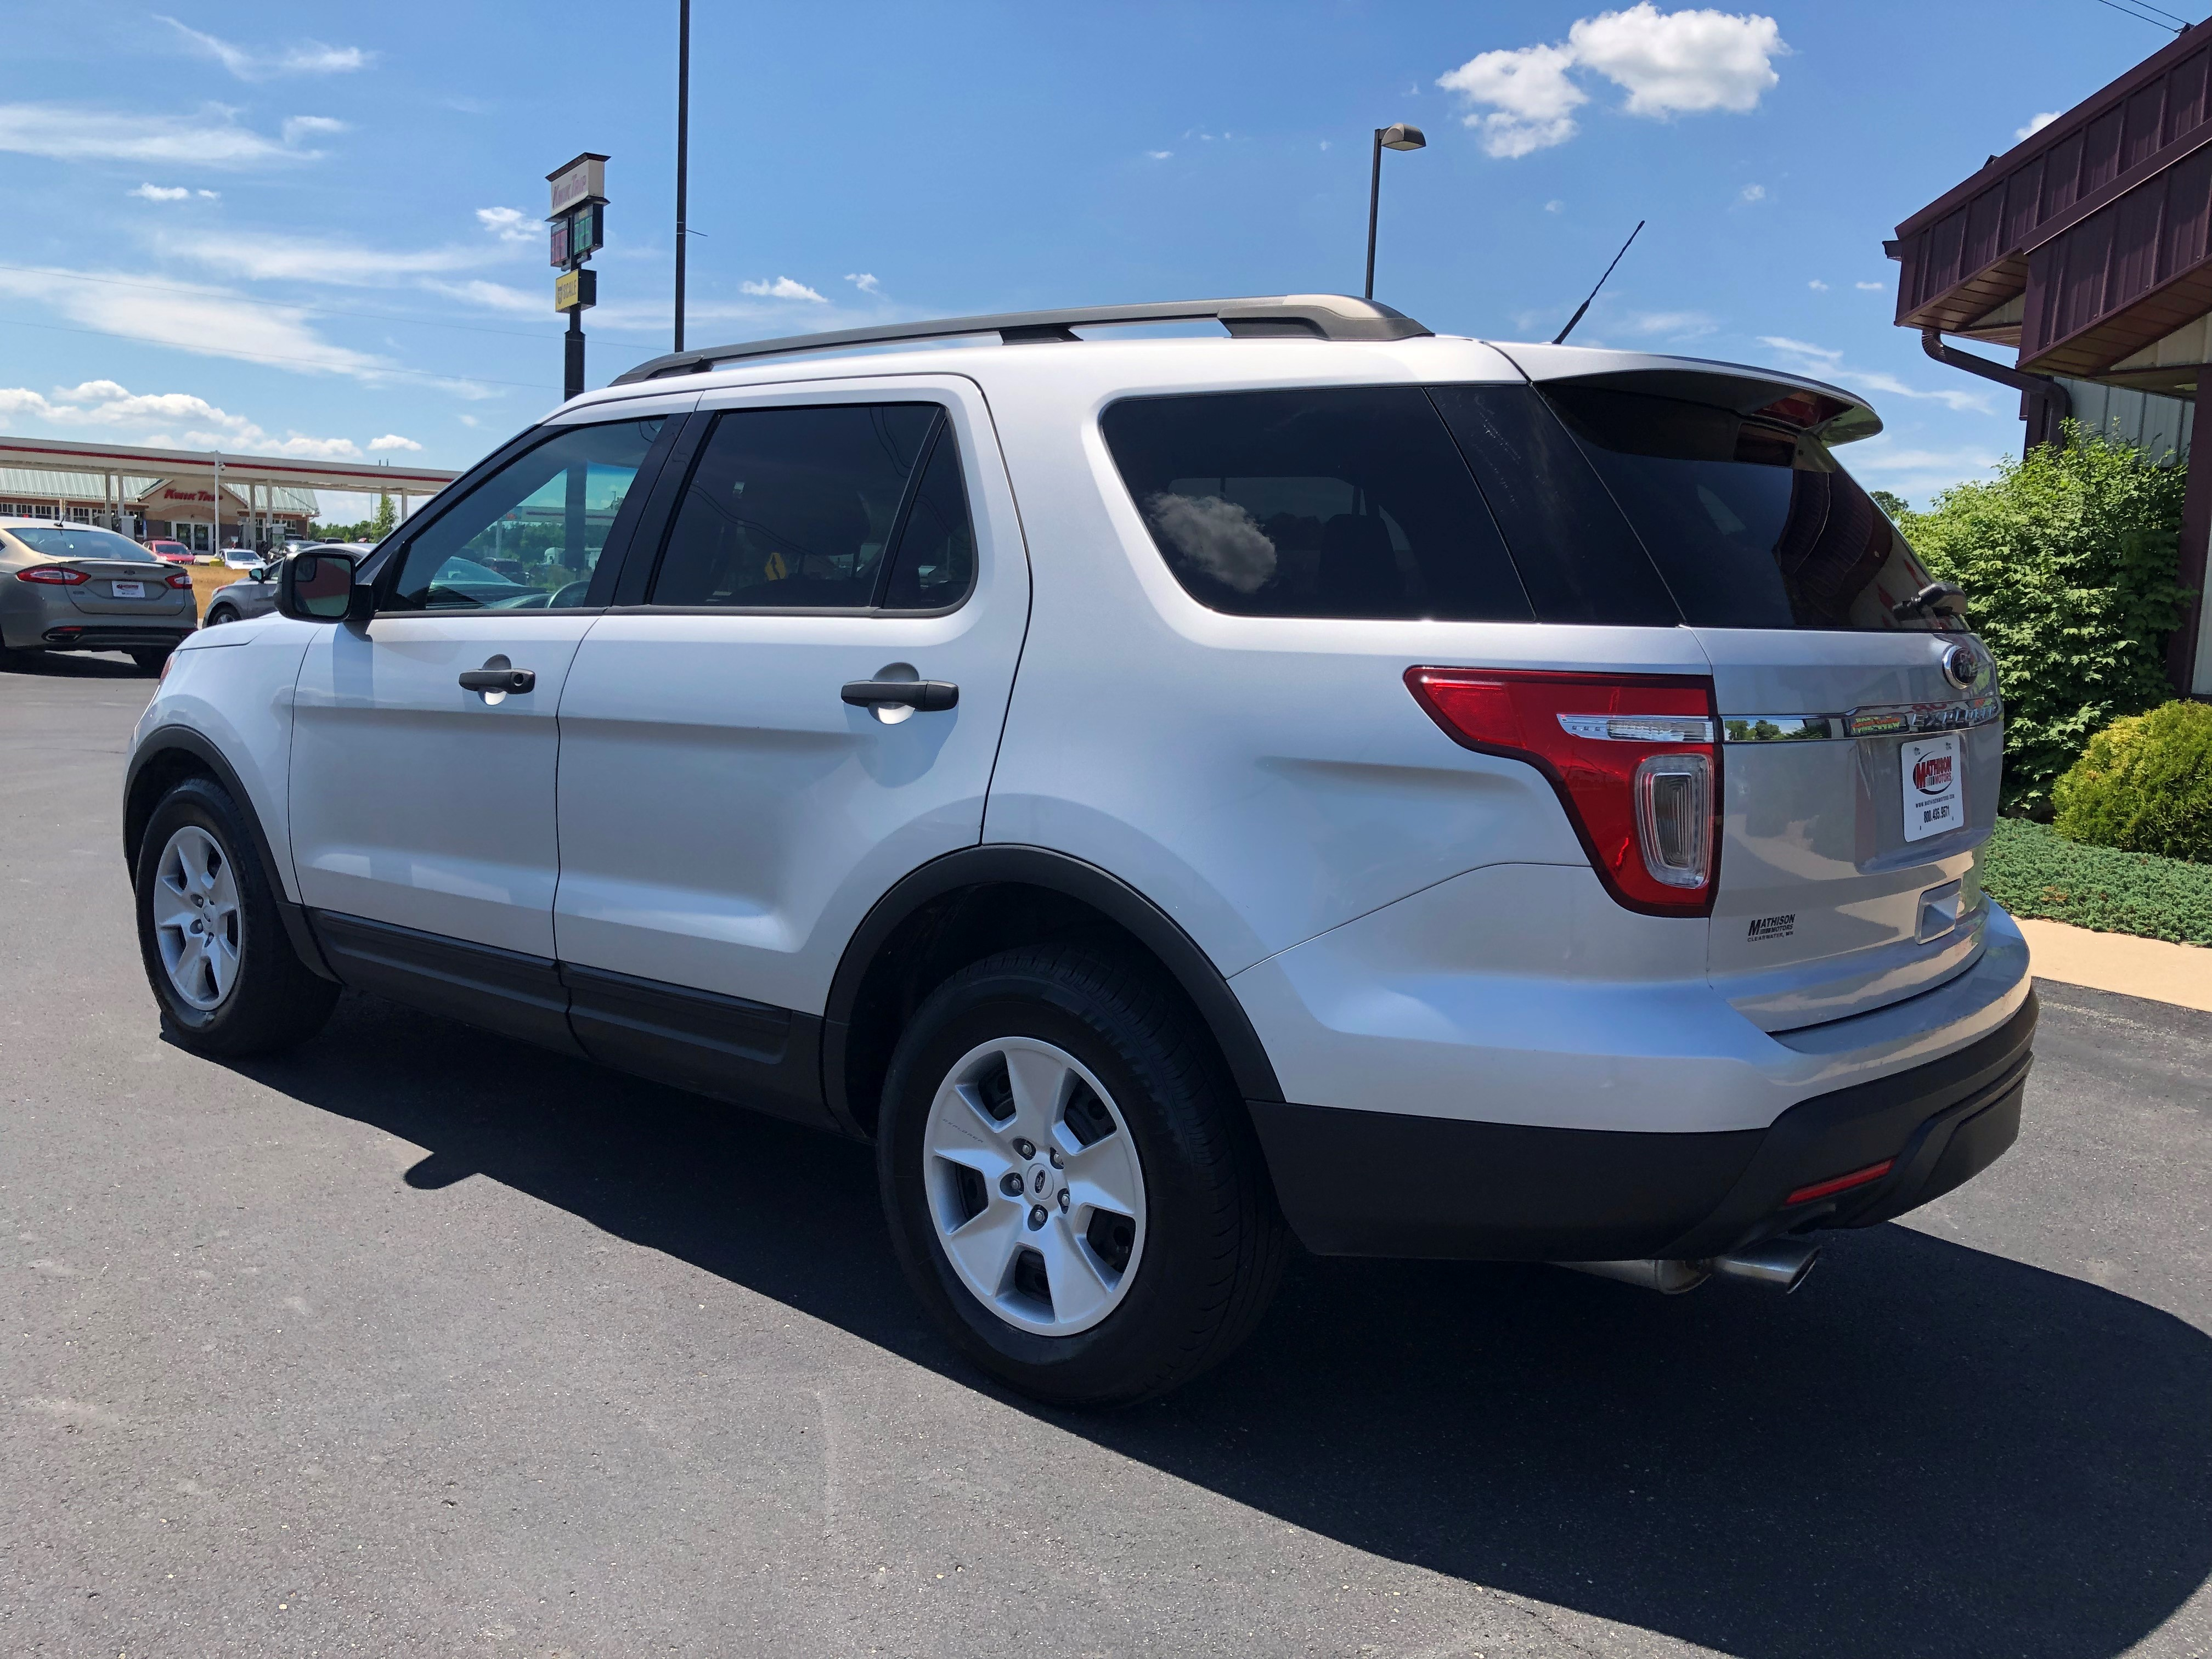 used vehicle - SUV FORD EXPLORER 2014